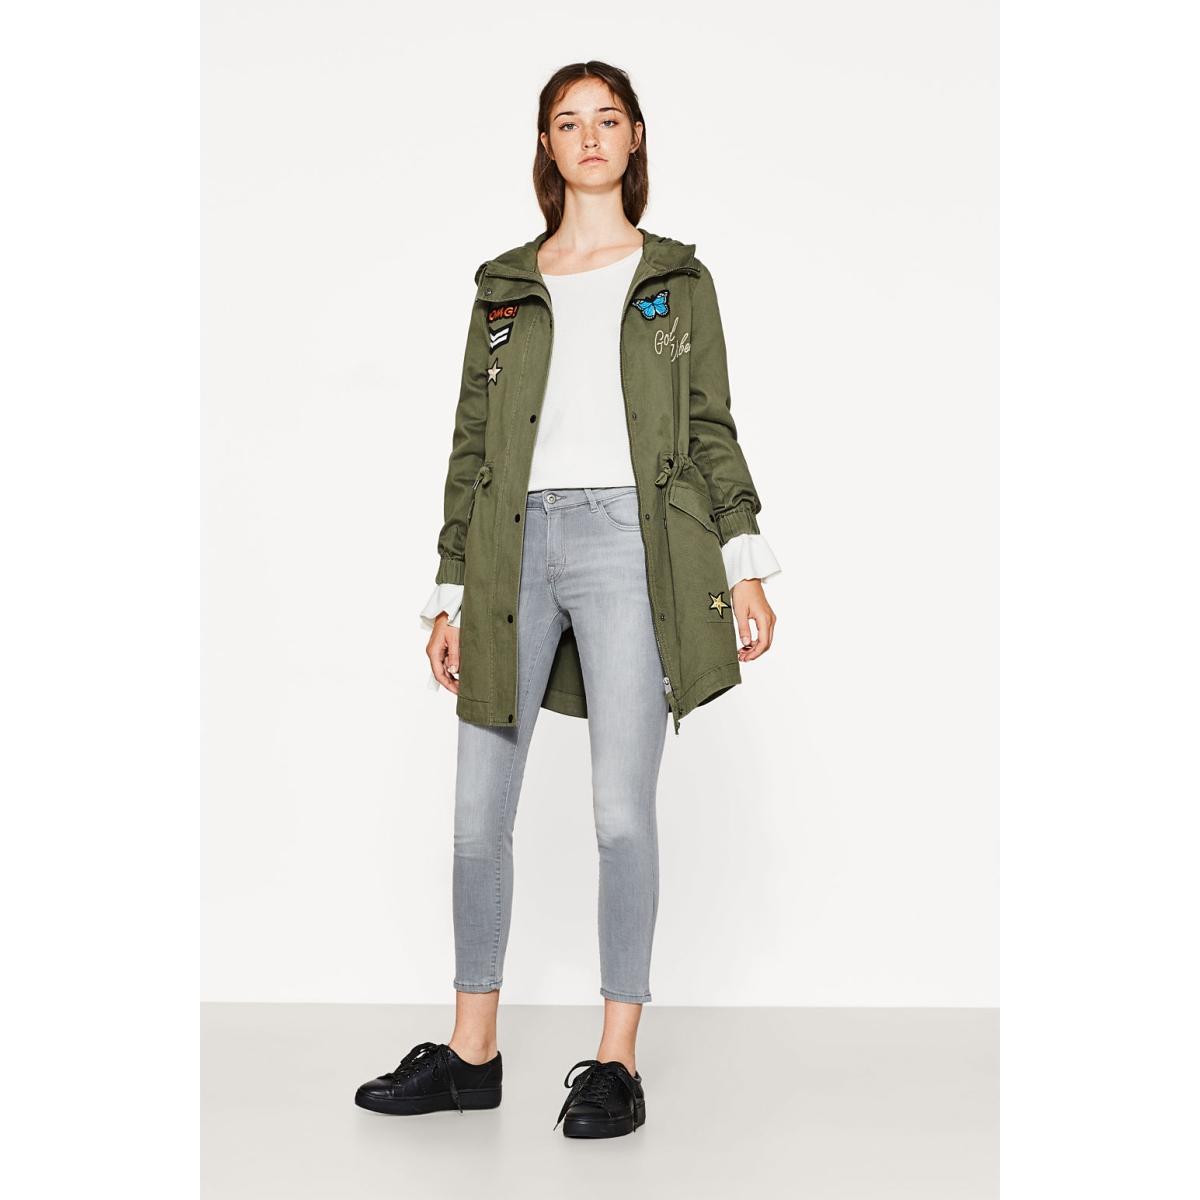 087cc1b042 edc jeans c923